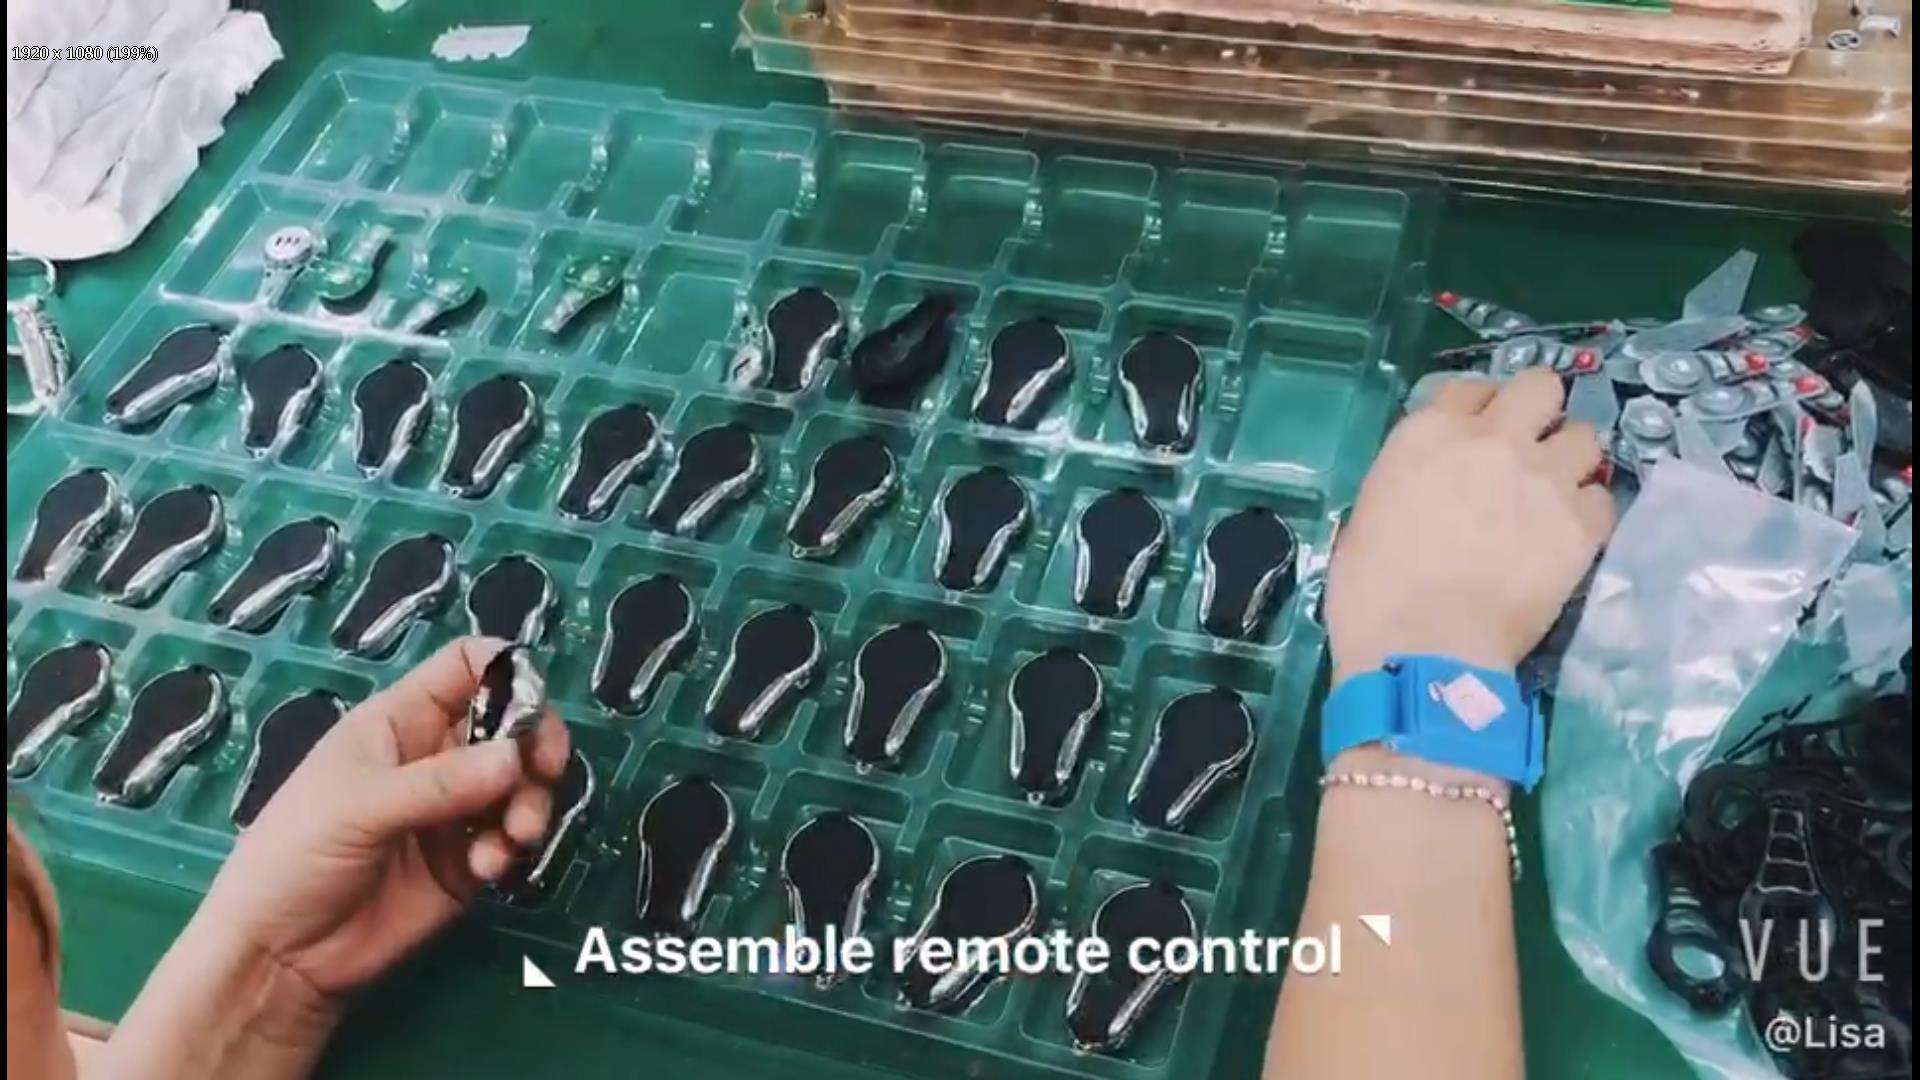 Assemble remote control